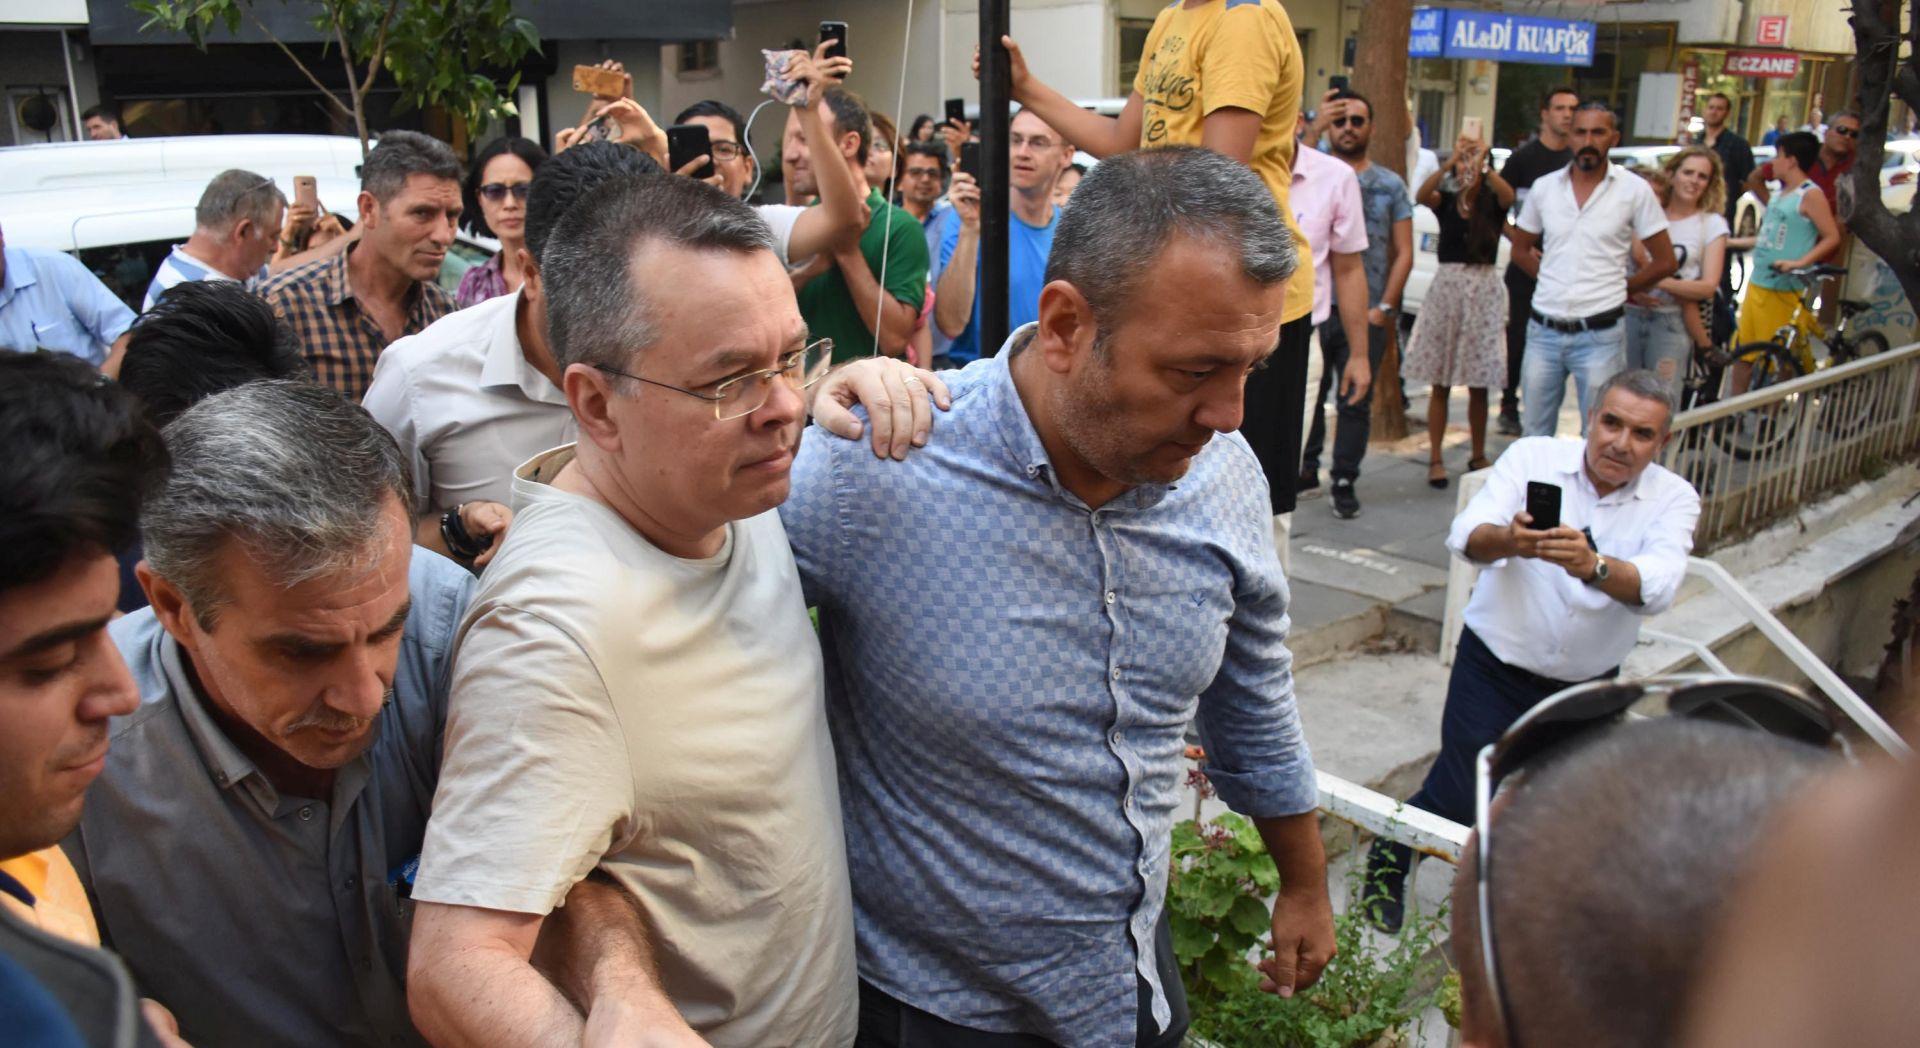 Pucano na američko veleposlanstvo u Ankari